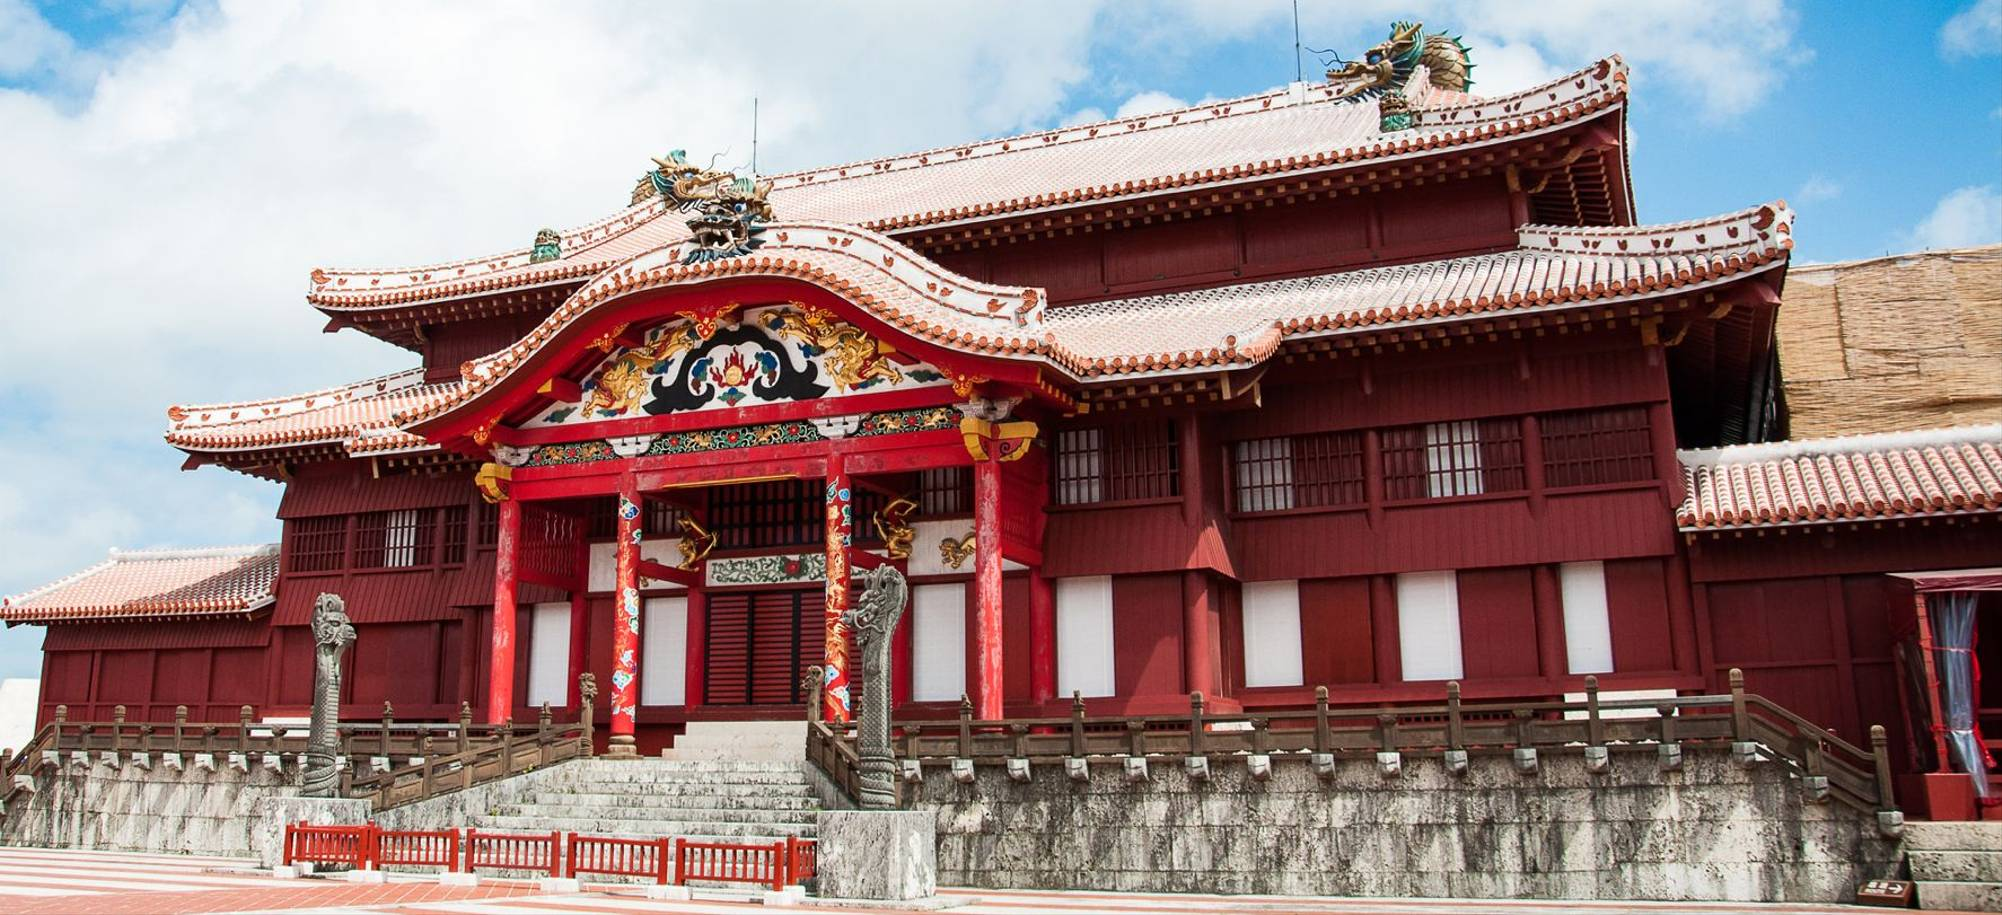 Naha - Shuri Castle - Itinerary Desktop .jpg